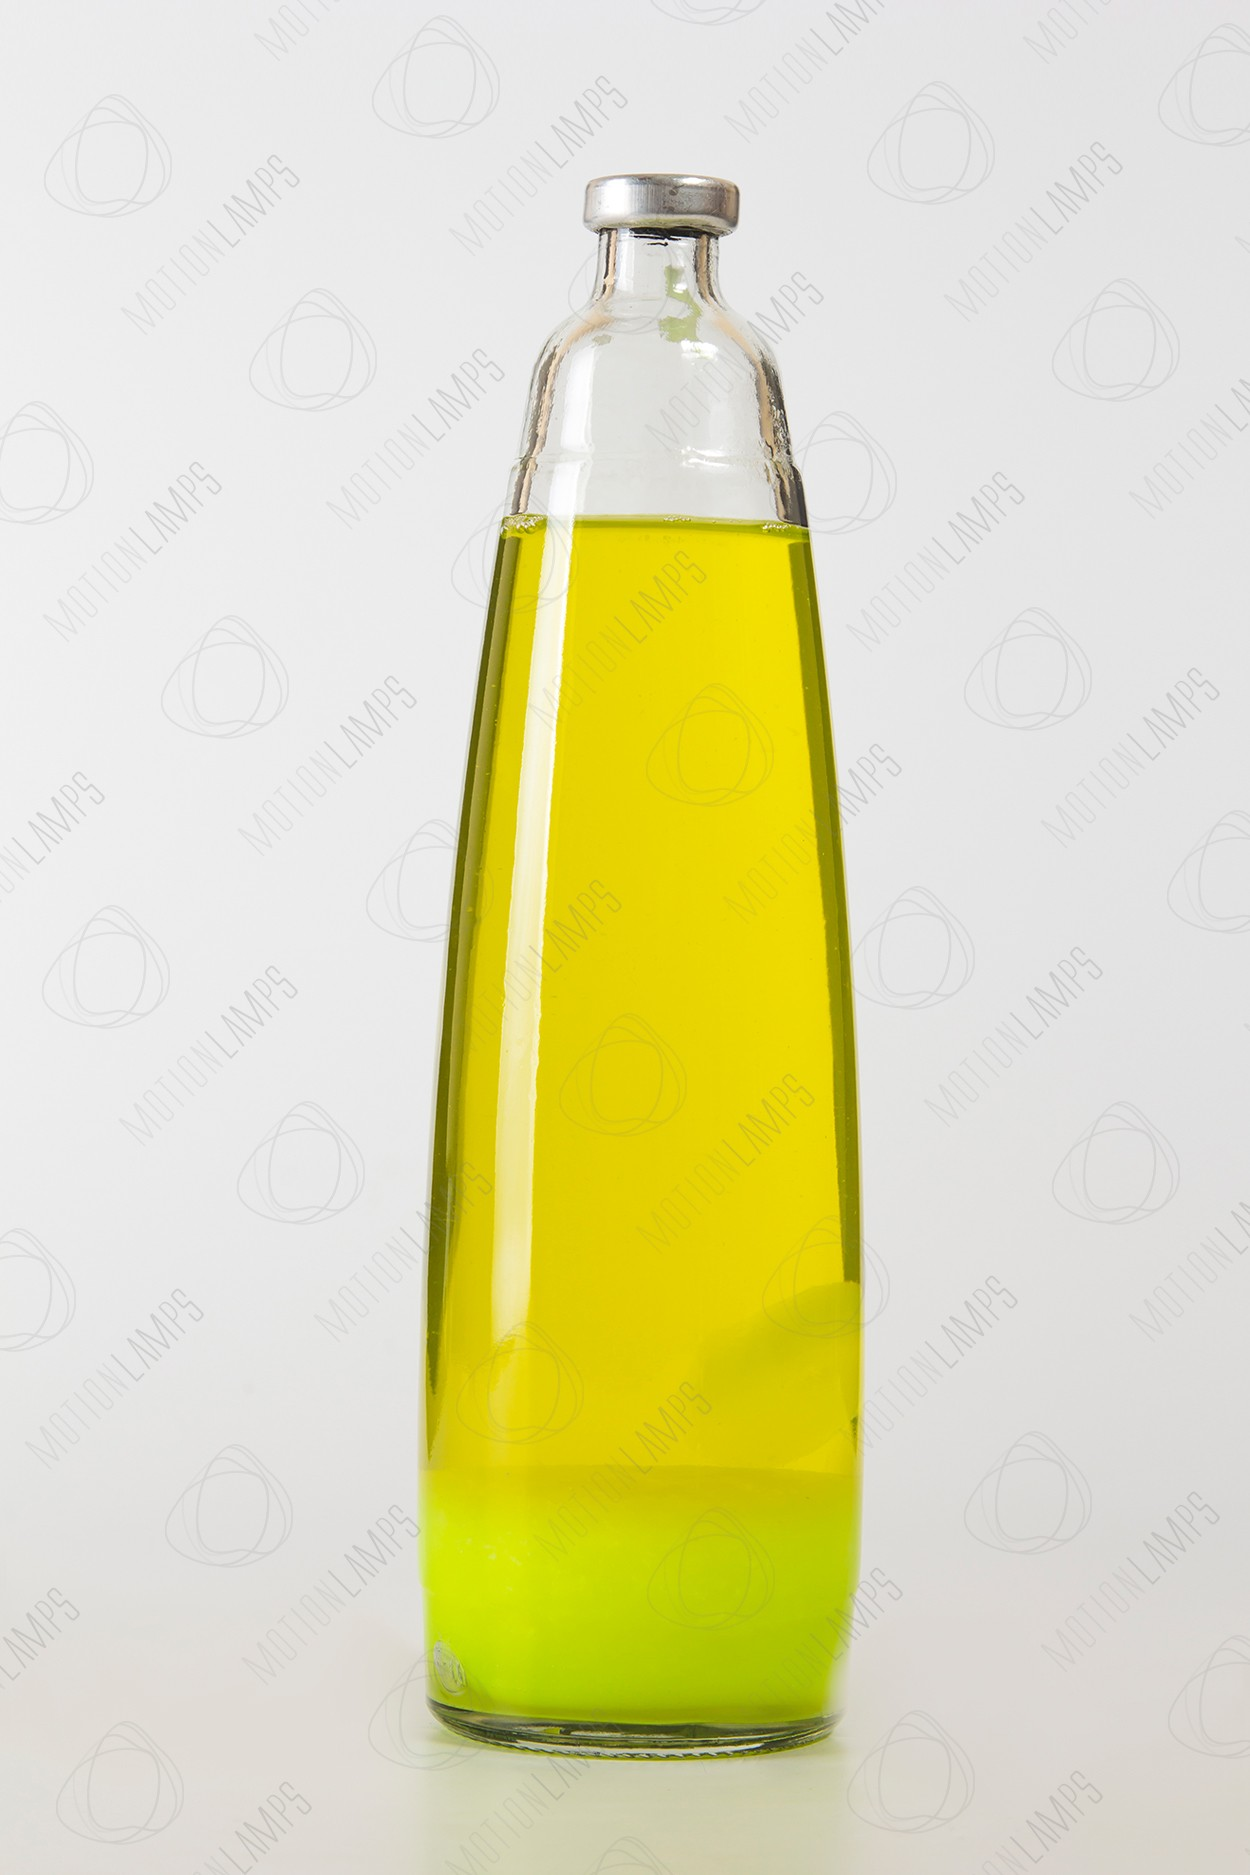 Колба для лава-лампы 35см Жёлтая/Жёлтая